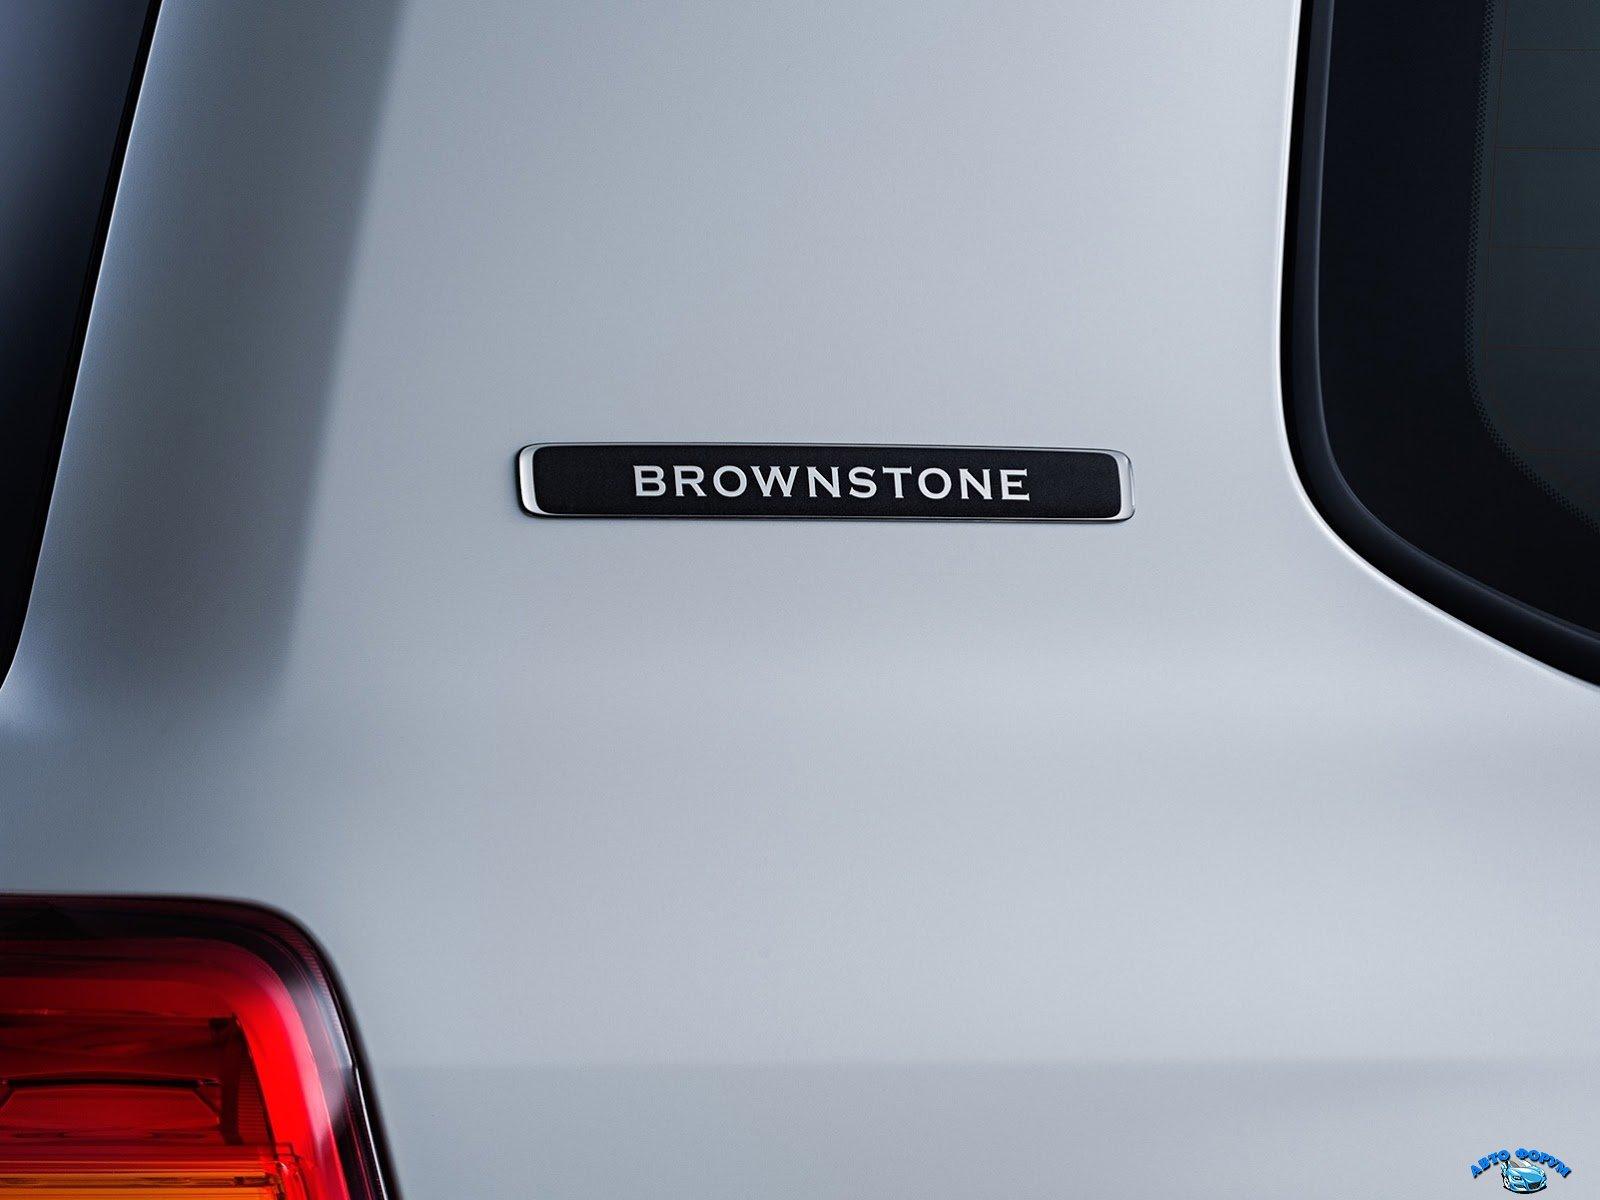 Toyota-LandCruiser-200-Special-23 brownstone.jpg